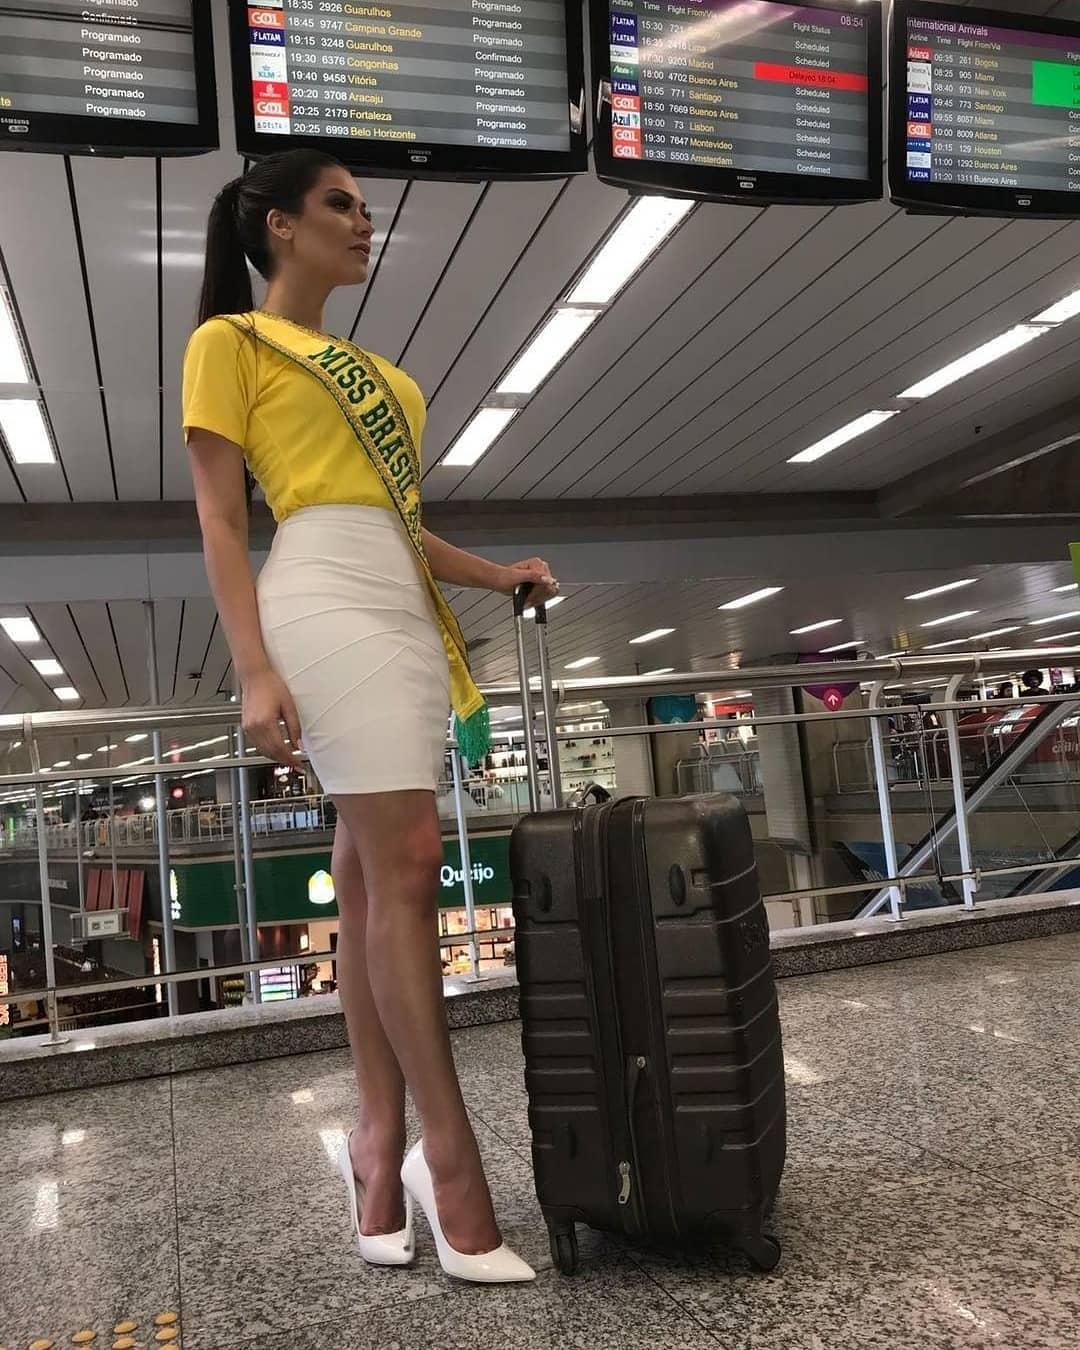 gleycy correia, miss brasil continentes unidos 2018. - Página 3 40704710